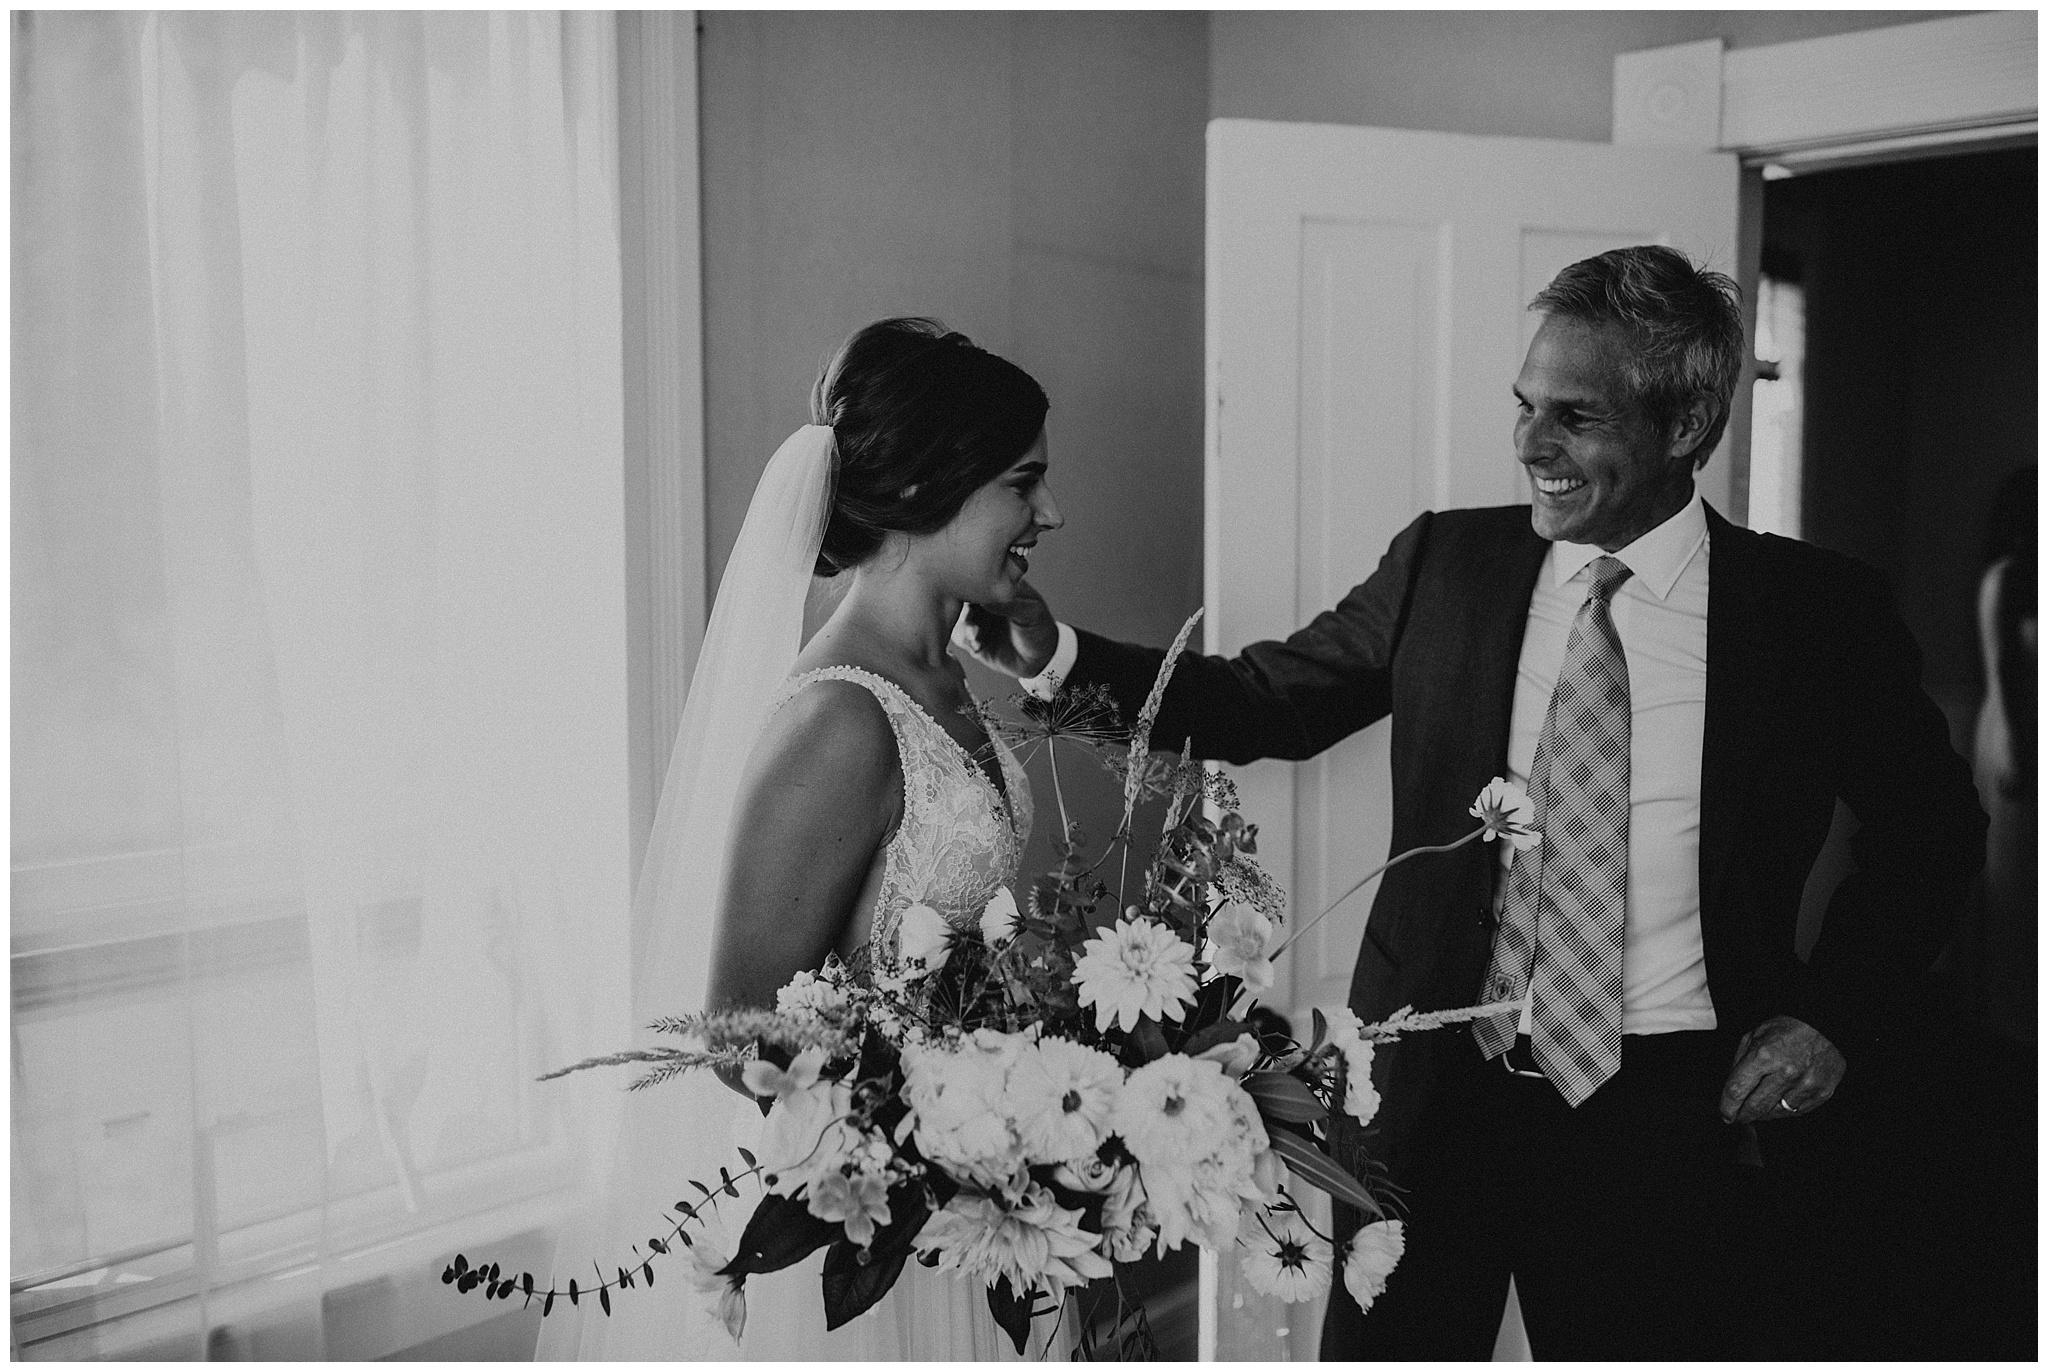 estate-248-wedding-langley-014.JPG